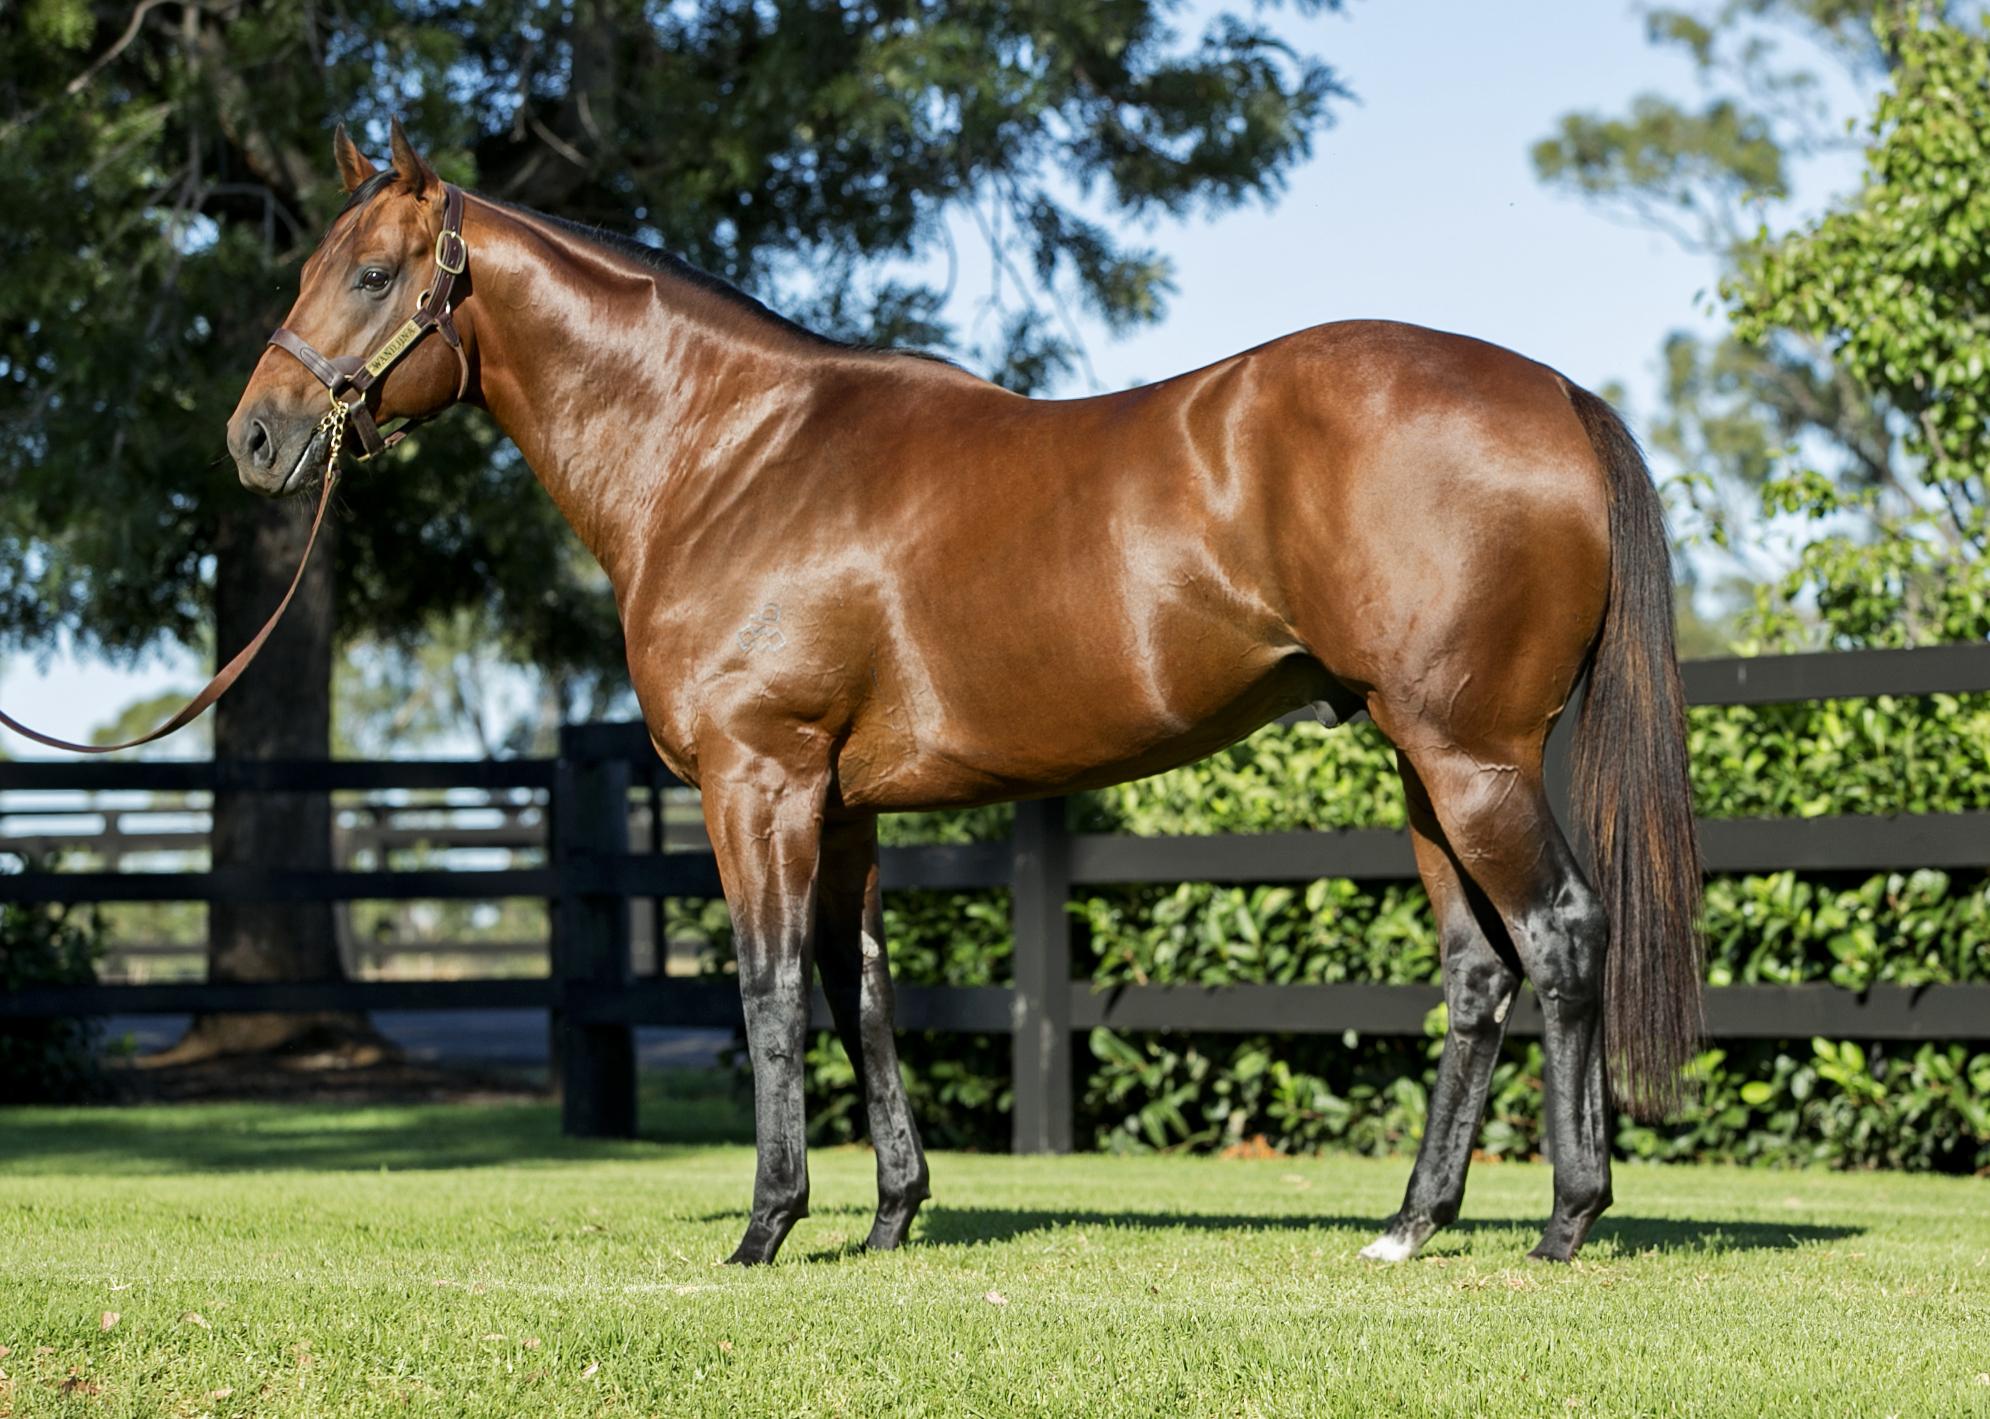 https://www.stallions.com.au/wp-content/uploads/2020/07/Wandjina-1.jpg